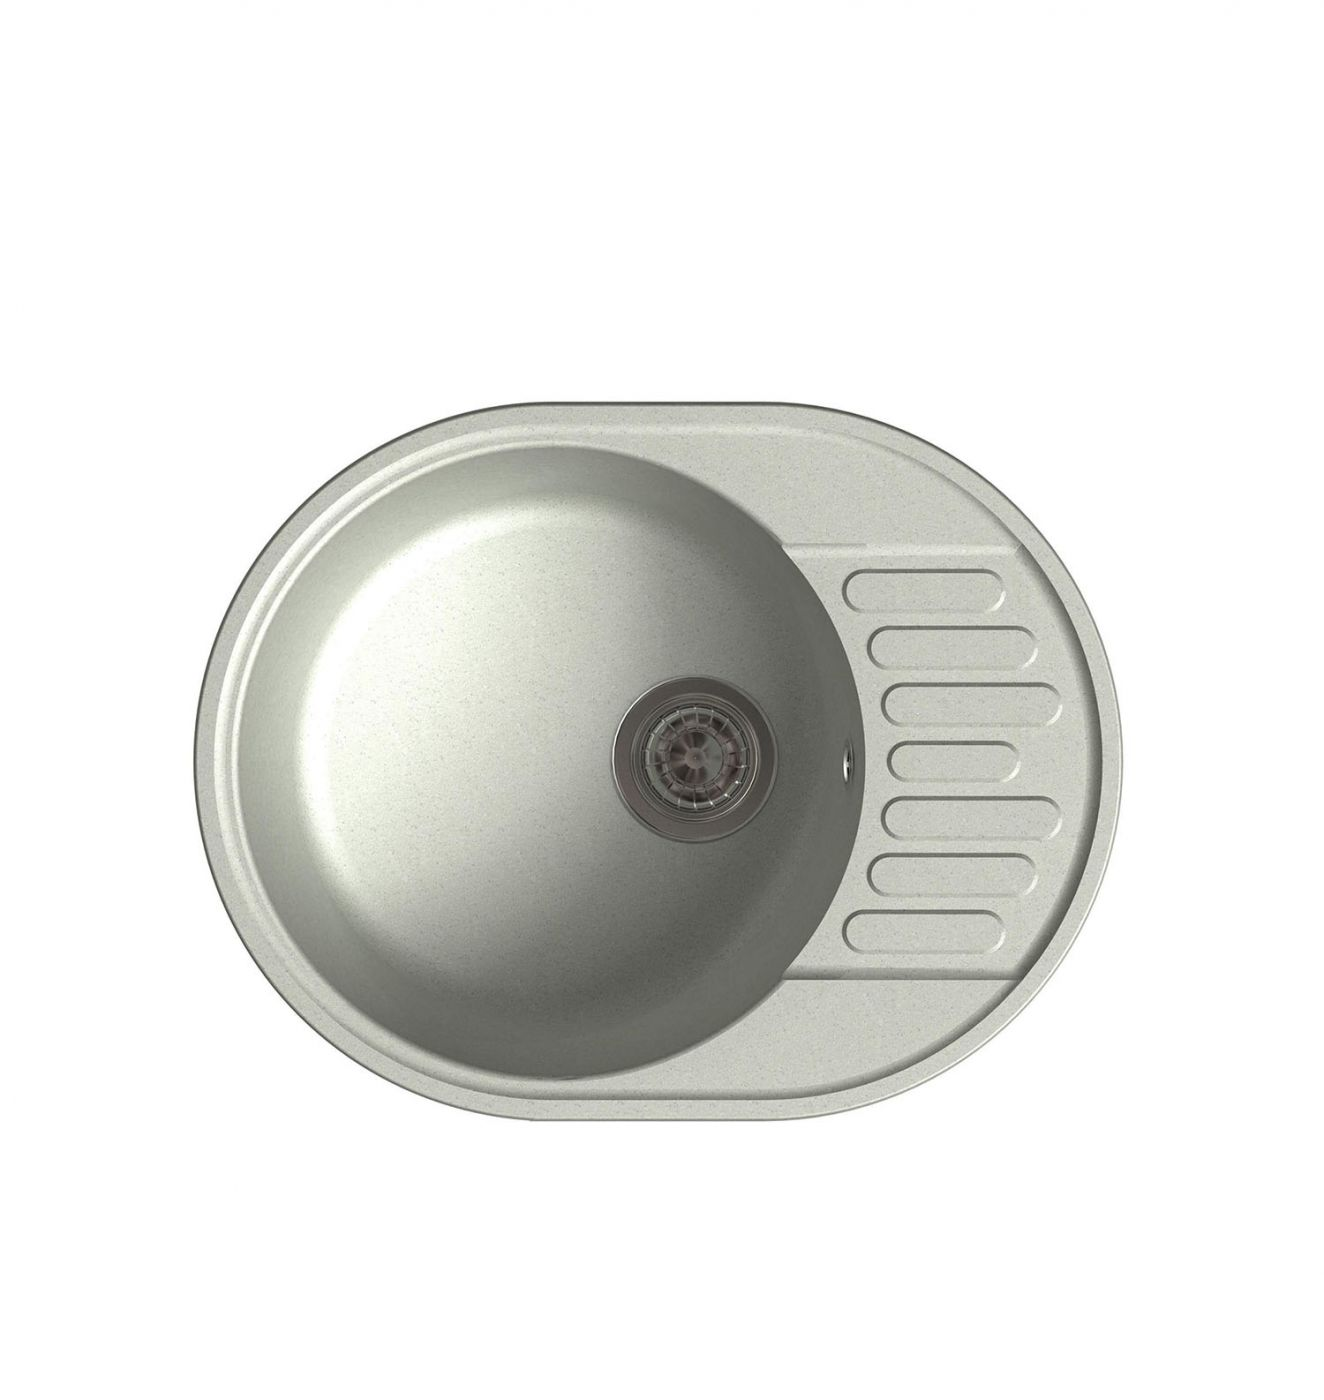 Врезная кухонная мойка LEX Orta 620 Space Gray  62х48см полимер RULE000030